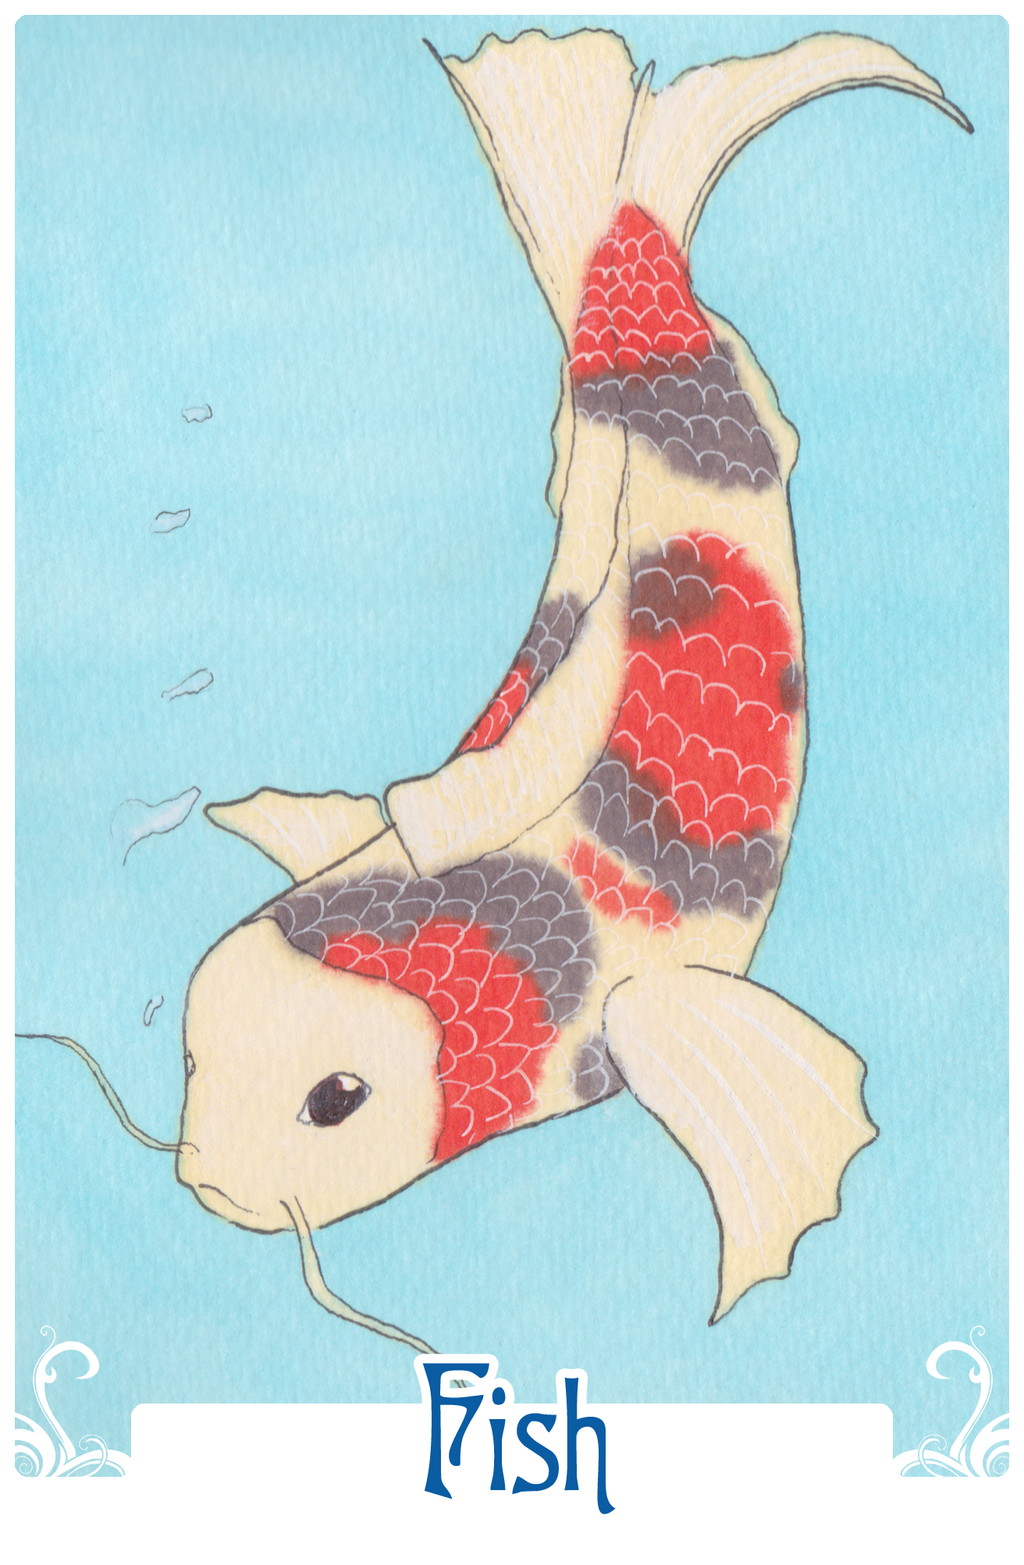 Fish (2014)